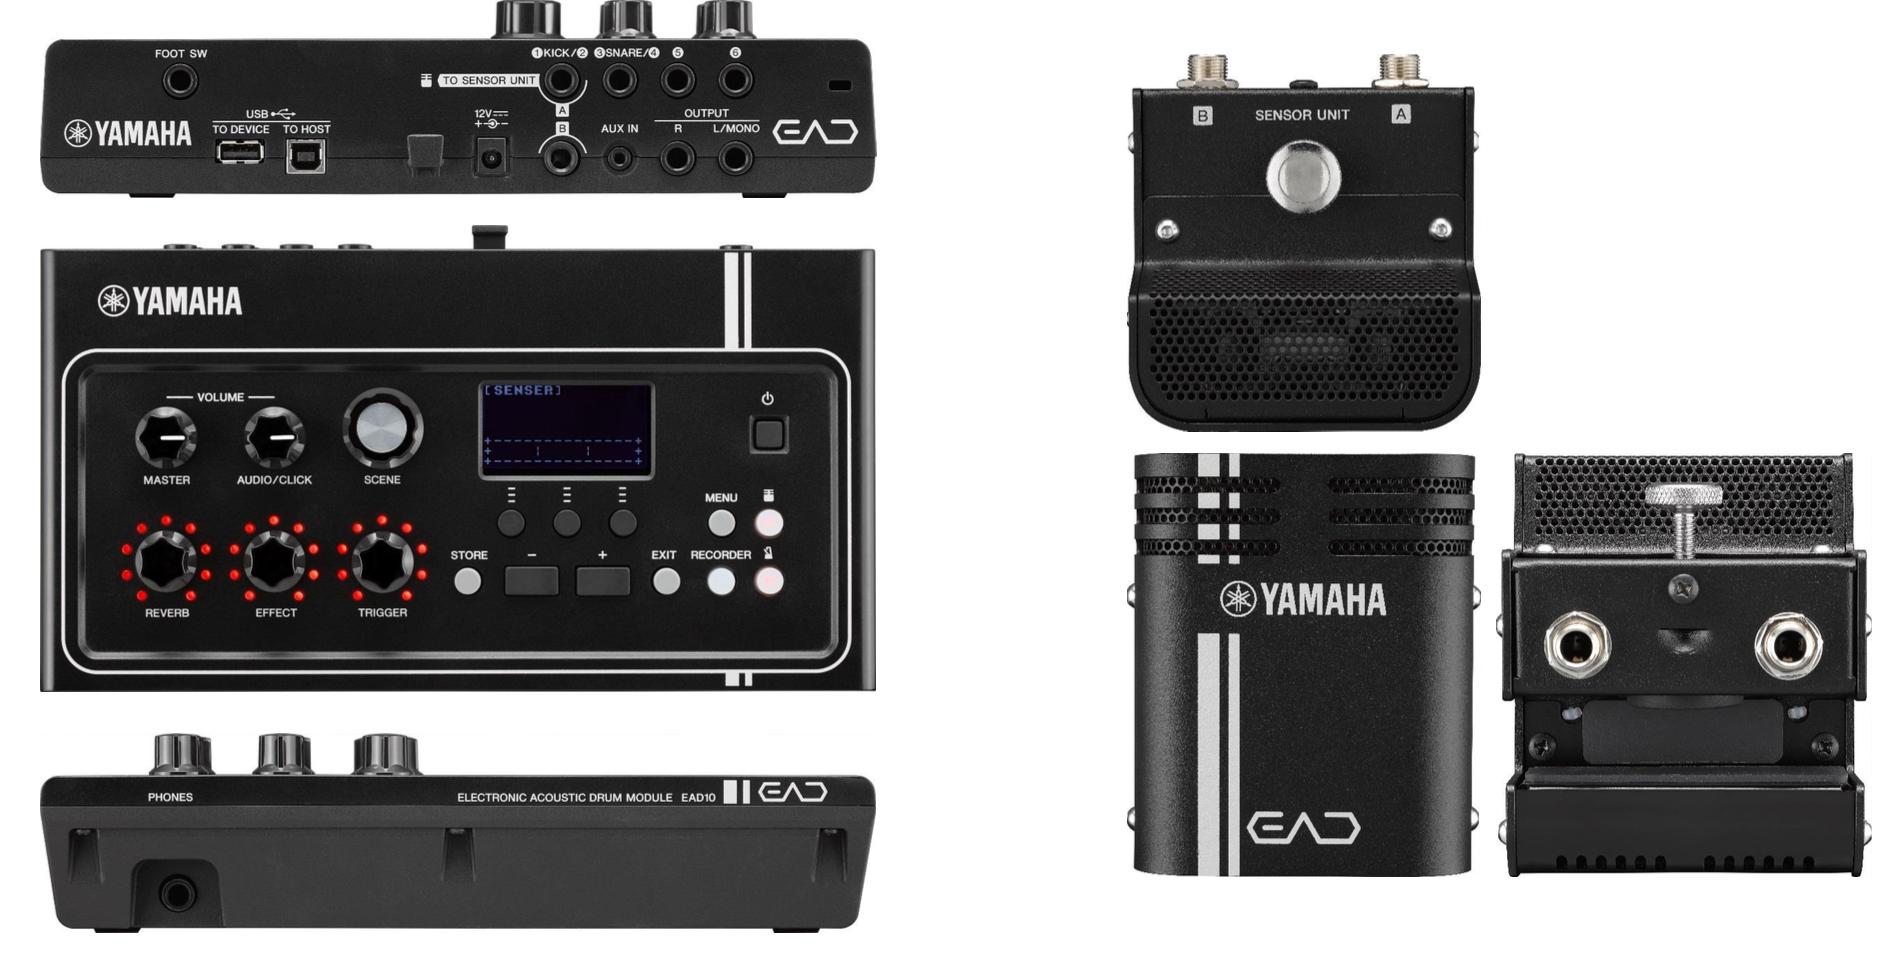 BeatIt testuje moduł Yamaha EAD10 z triggerem